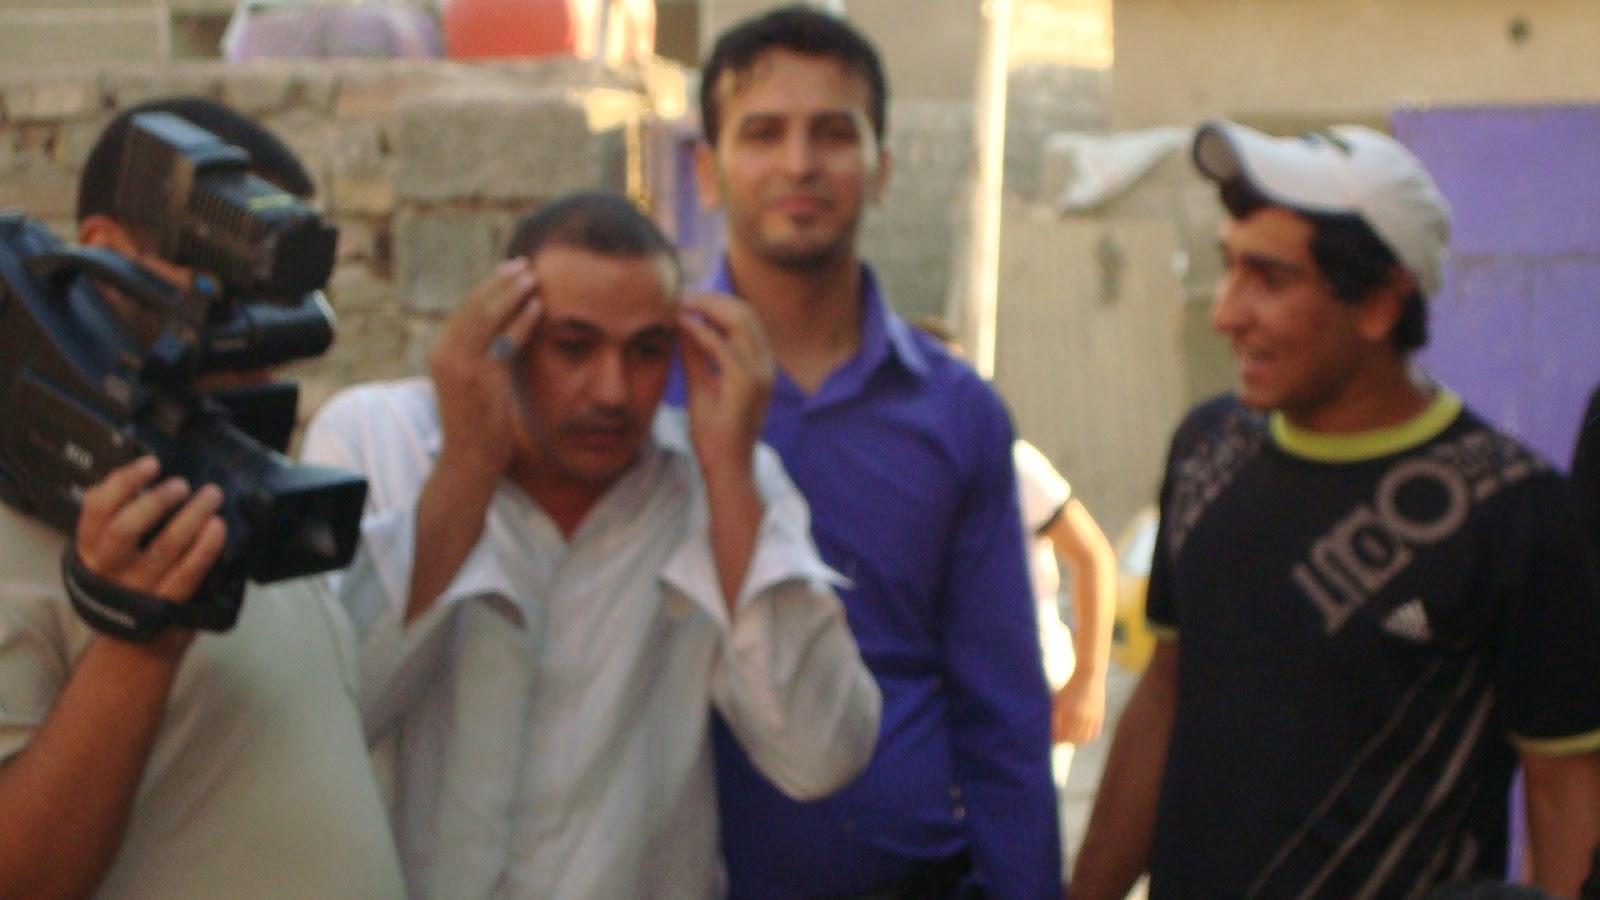 حسين الدراجي اولاد حسين الدراجي DSC00606